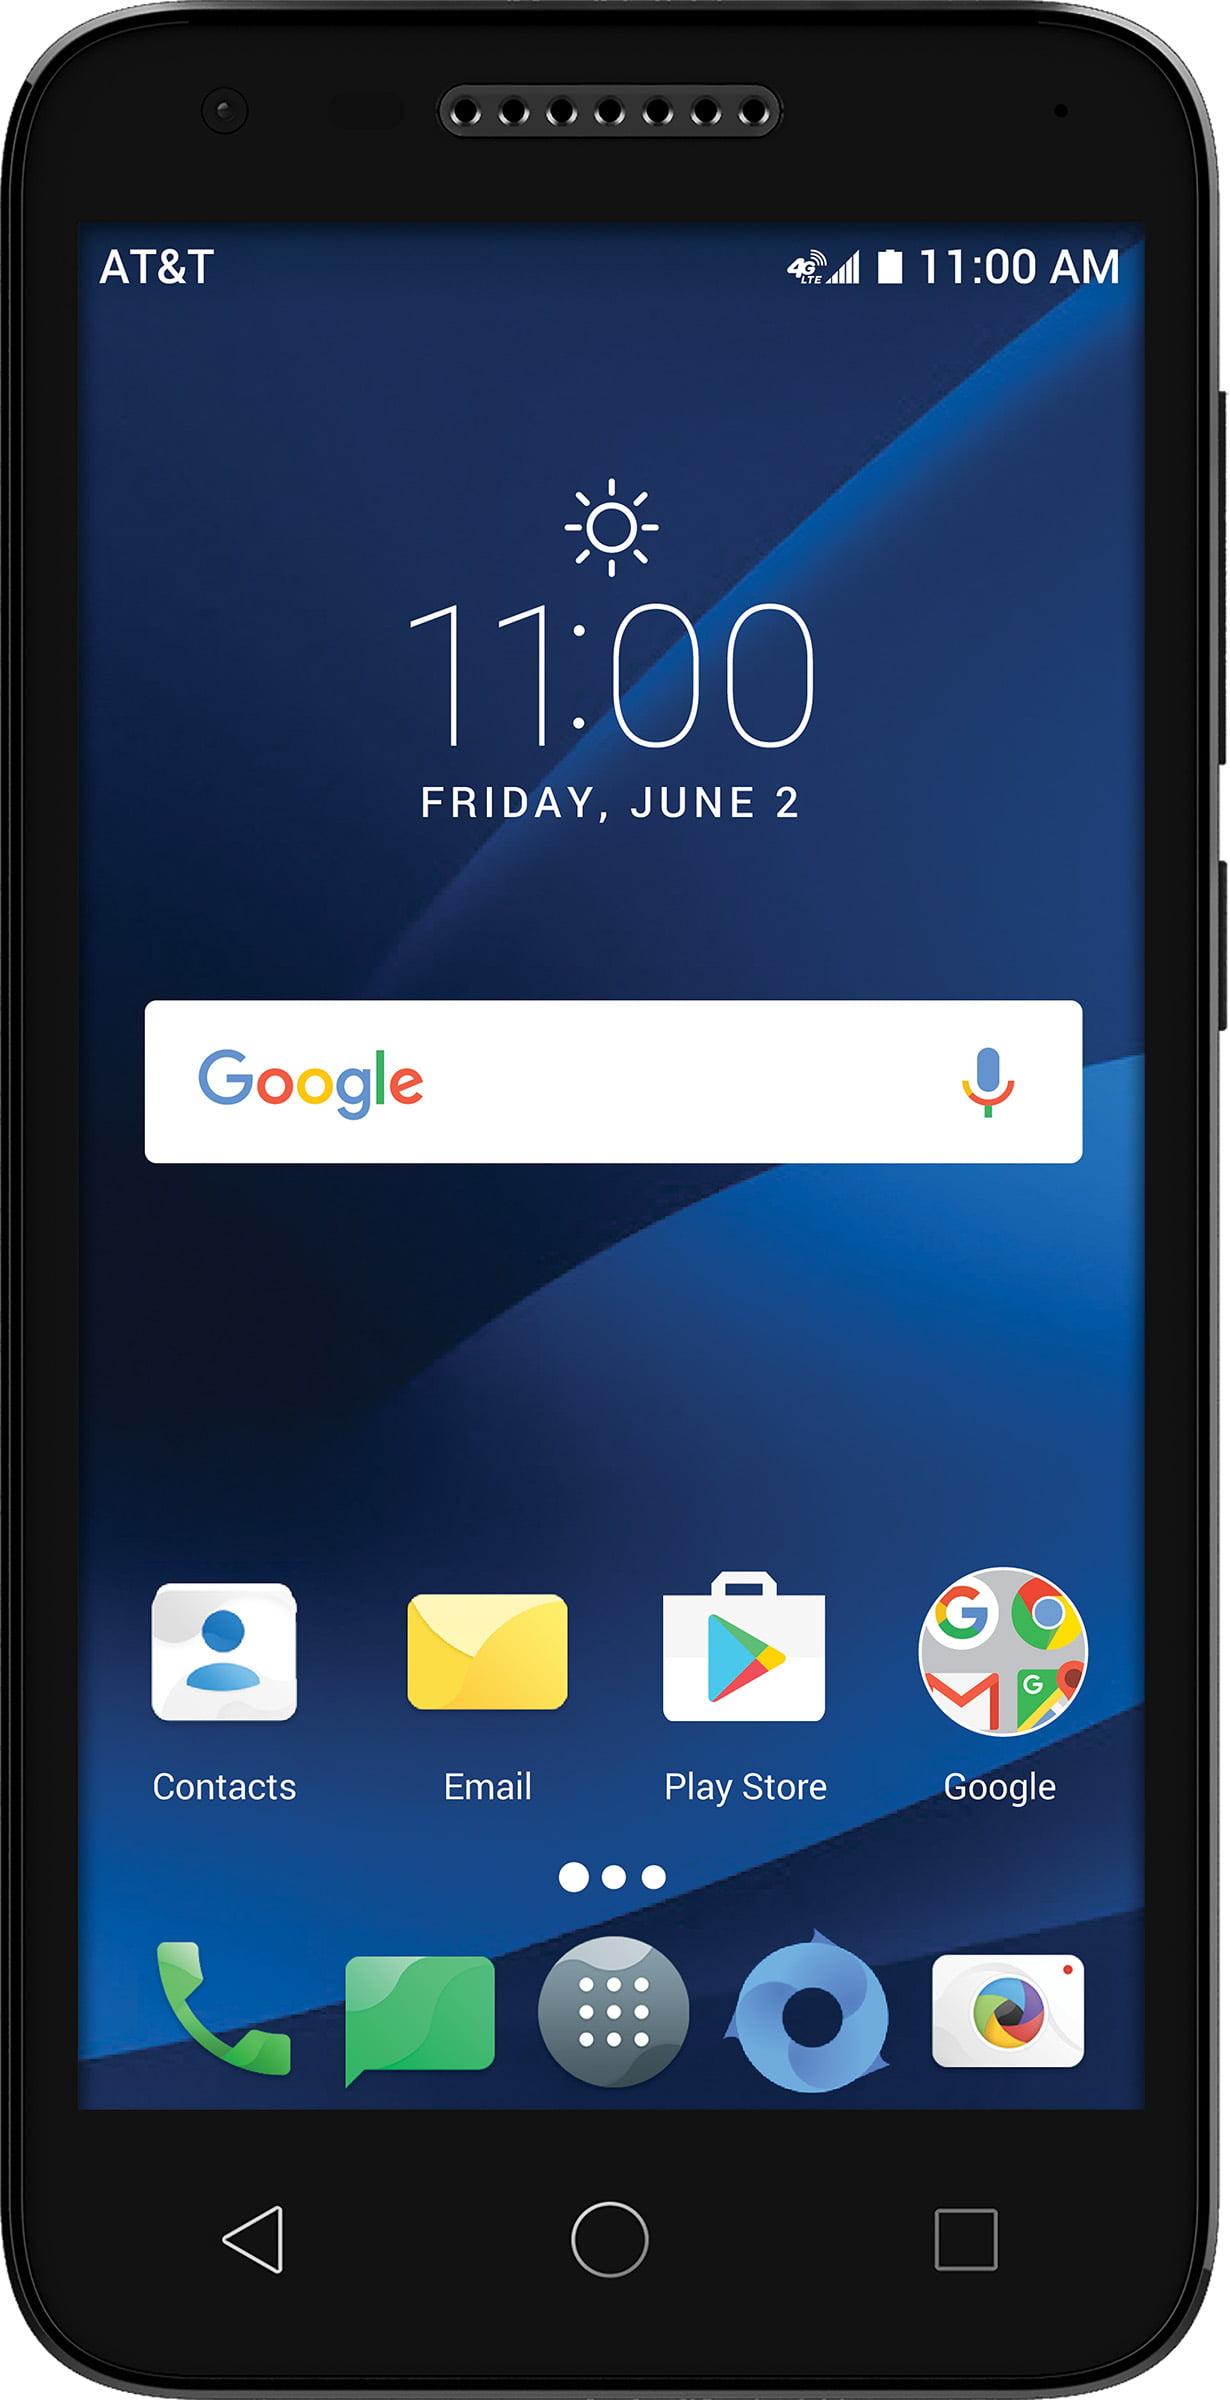 AT&T PREPAID Alcatel idealXCITE 8GB Prepaid Smartphone, Black